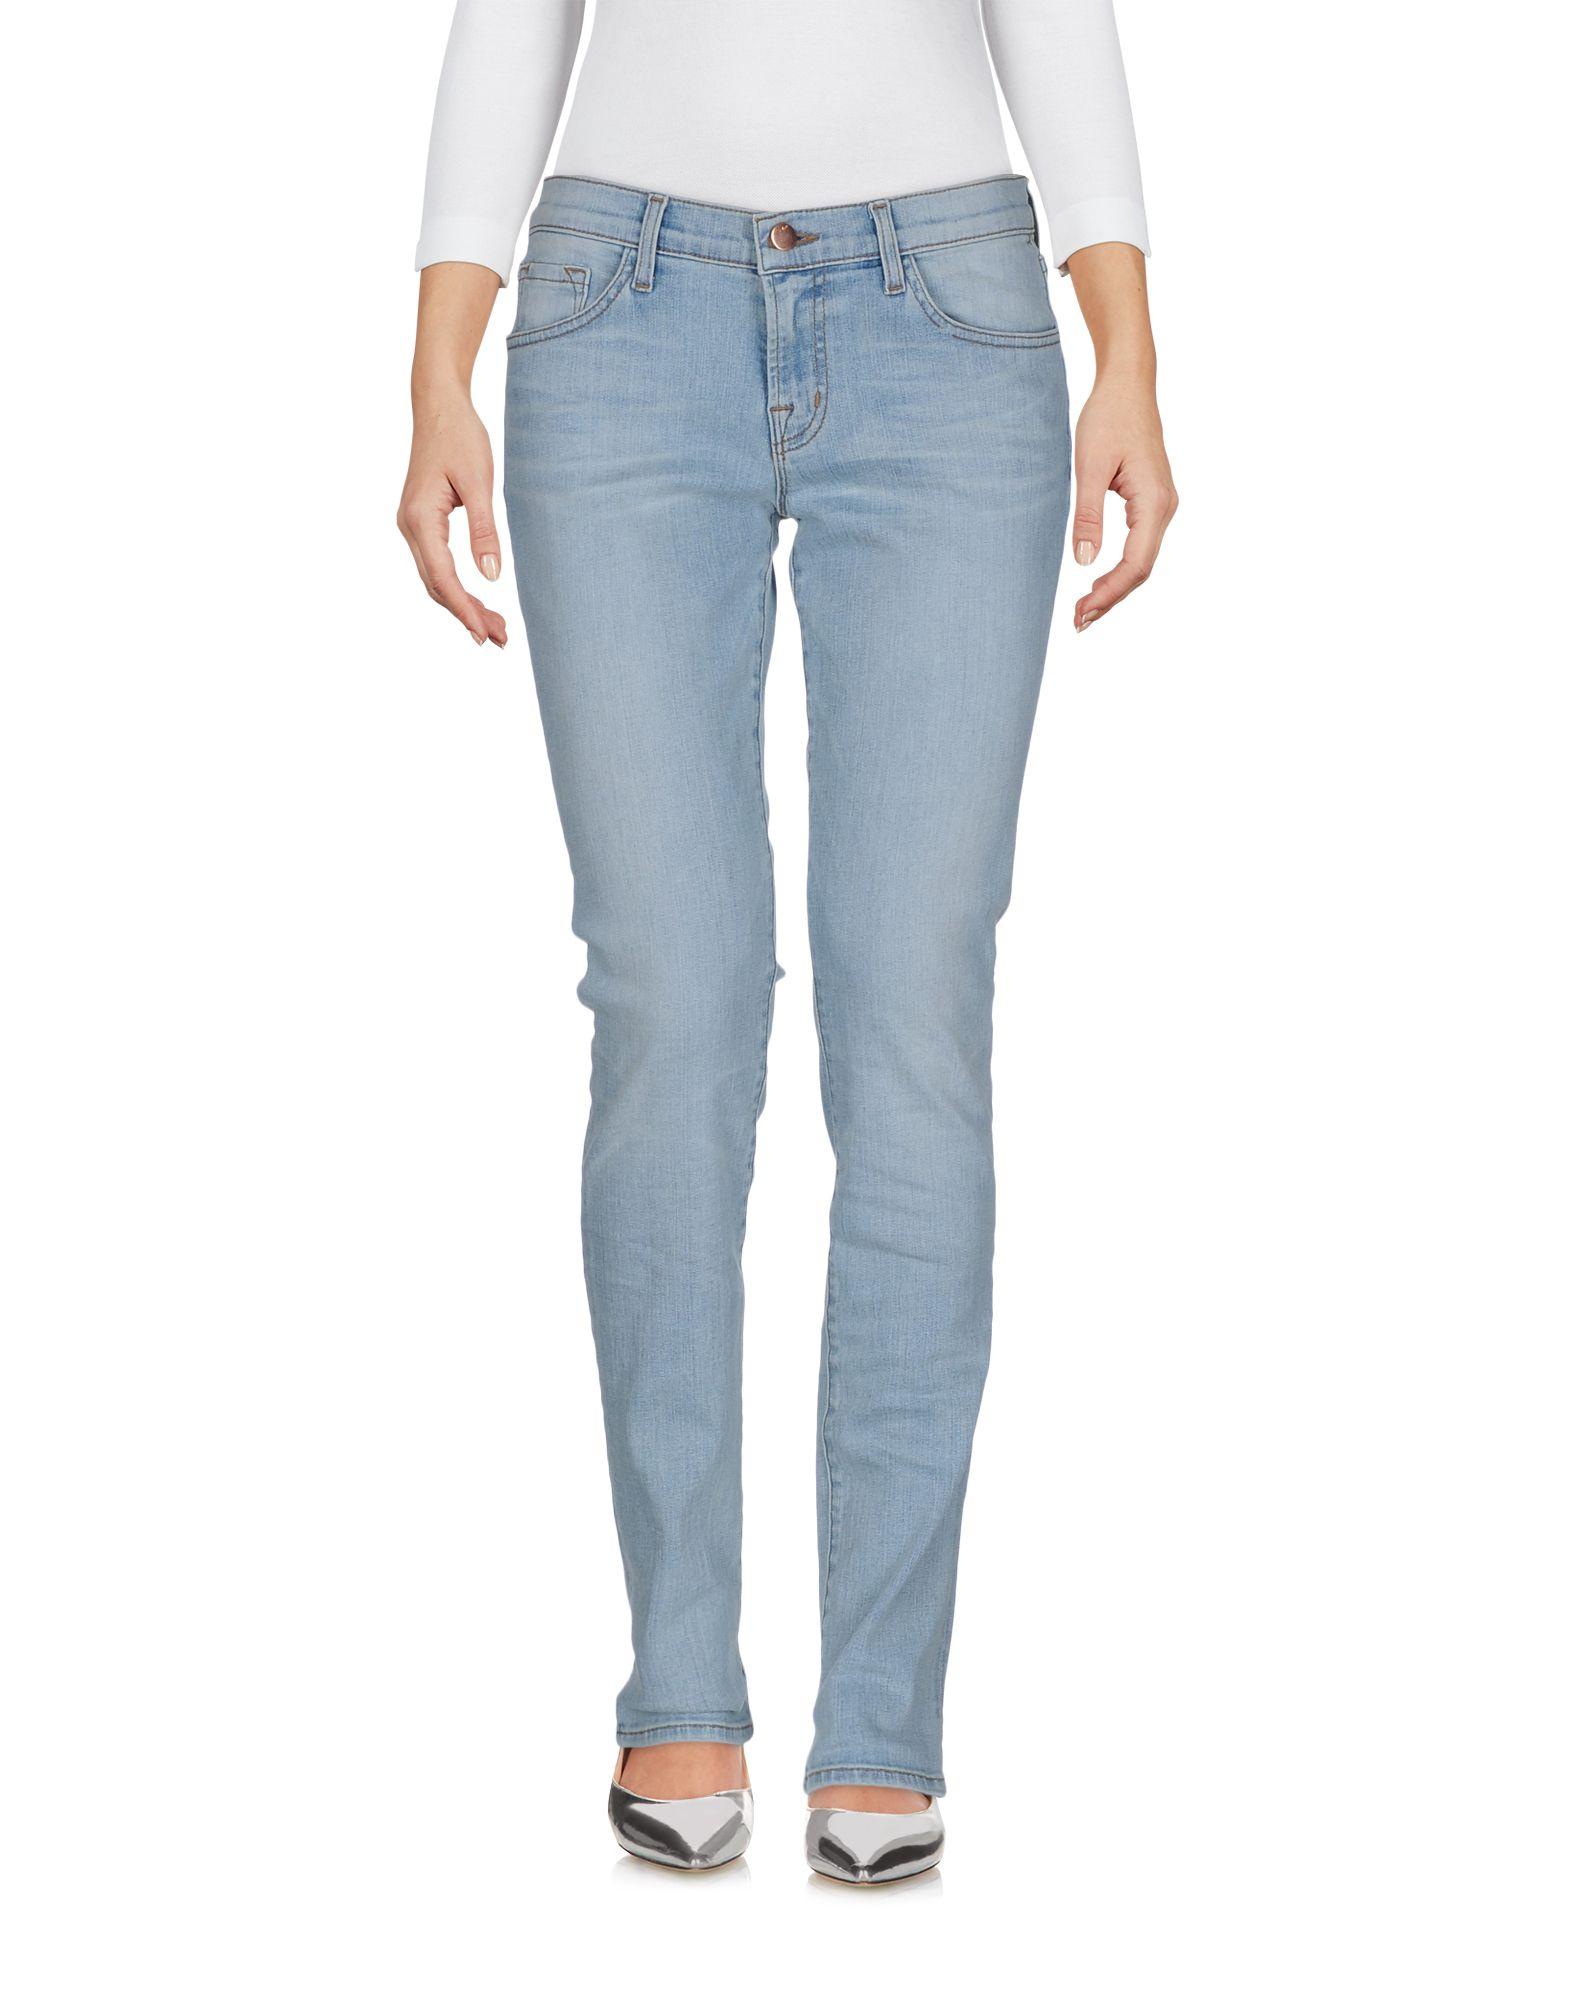 Pantaloni Jeans J Brand Donna - Acquista online su cO5xk0